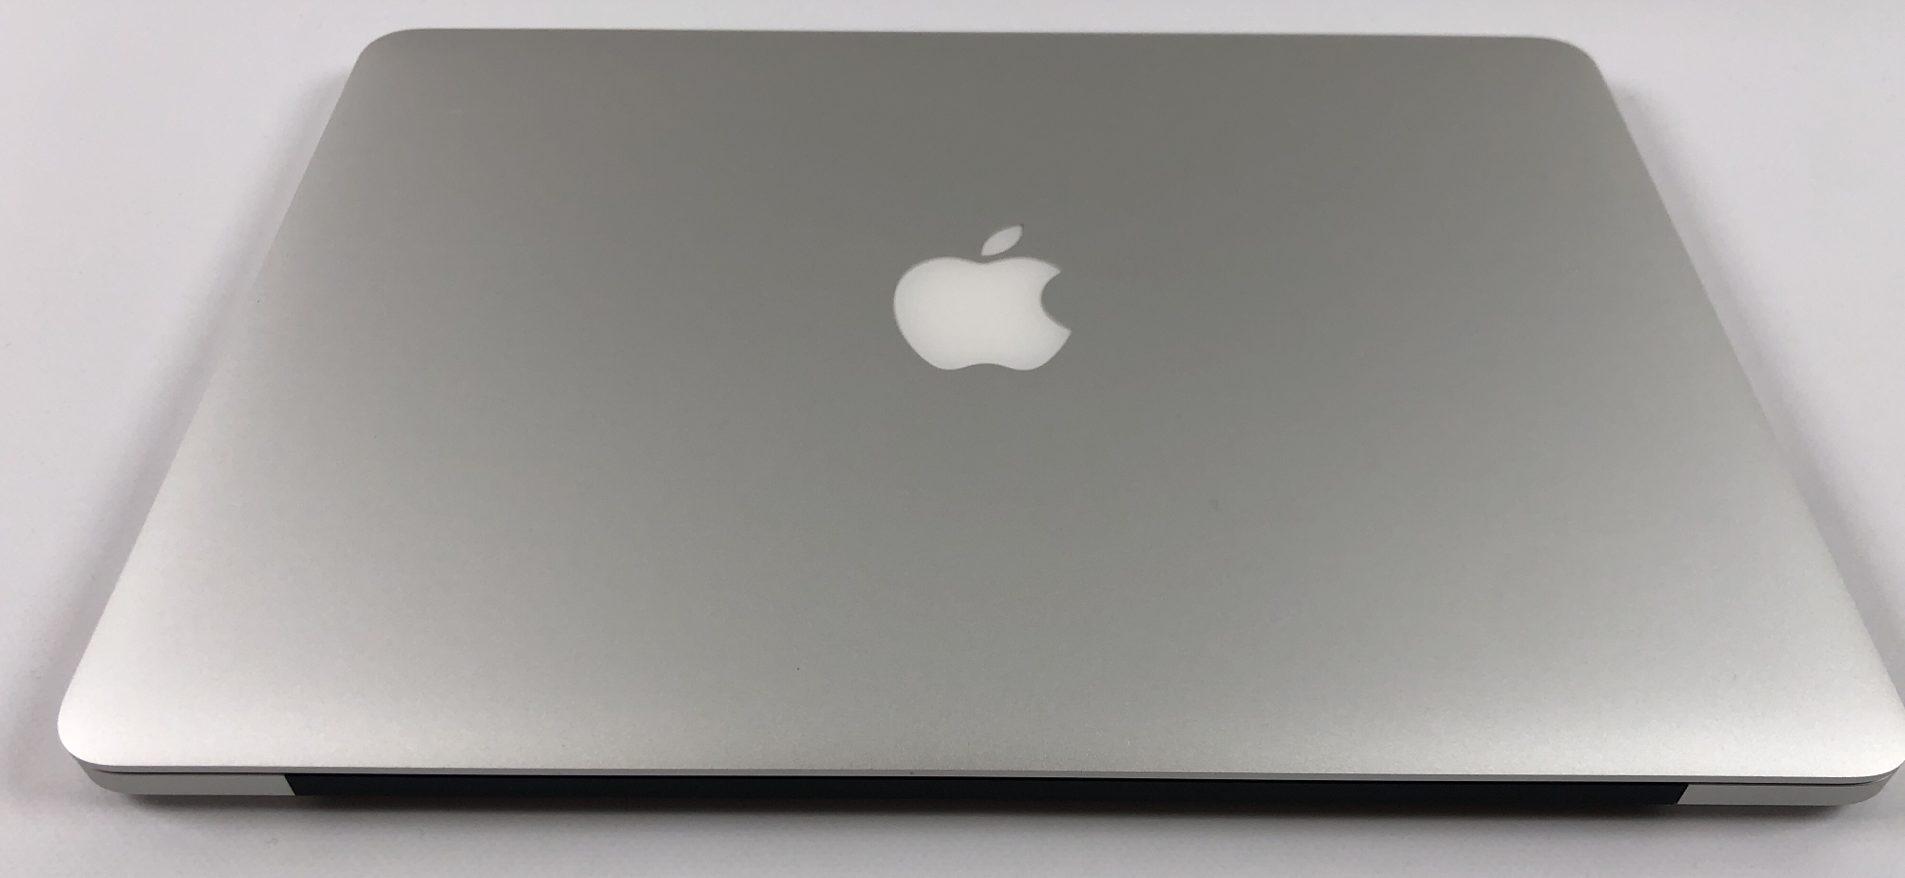 "MacBook Pro Retina 13"" Early 2015 (Intel Core i5 2.9 GHz 8 GB RAM 512 GB SSD), Intel Core i5 2.9 GHz, 8 GB RAM, 512 GB SSD, image 2"